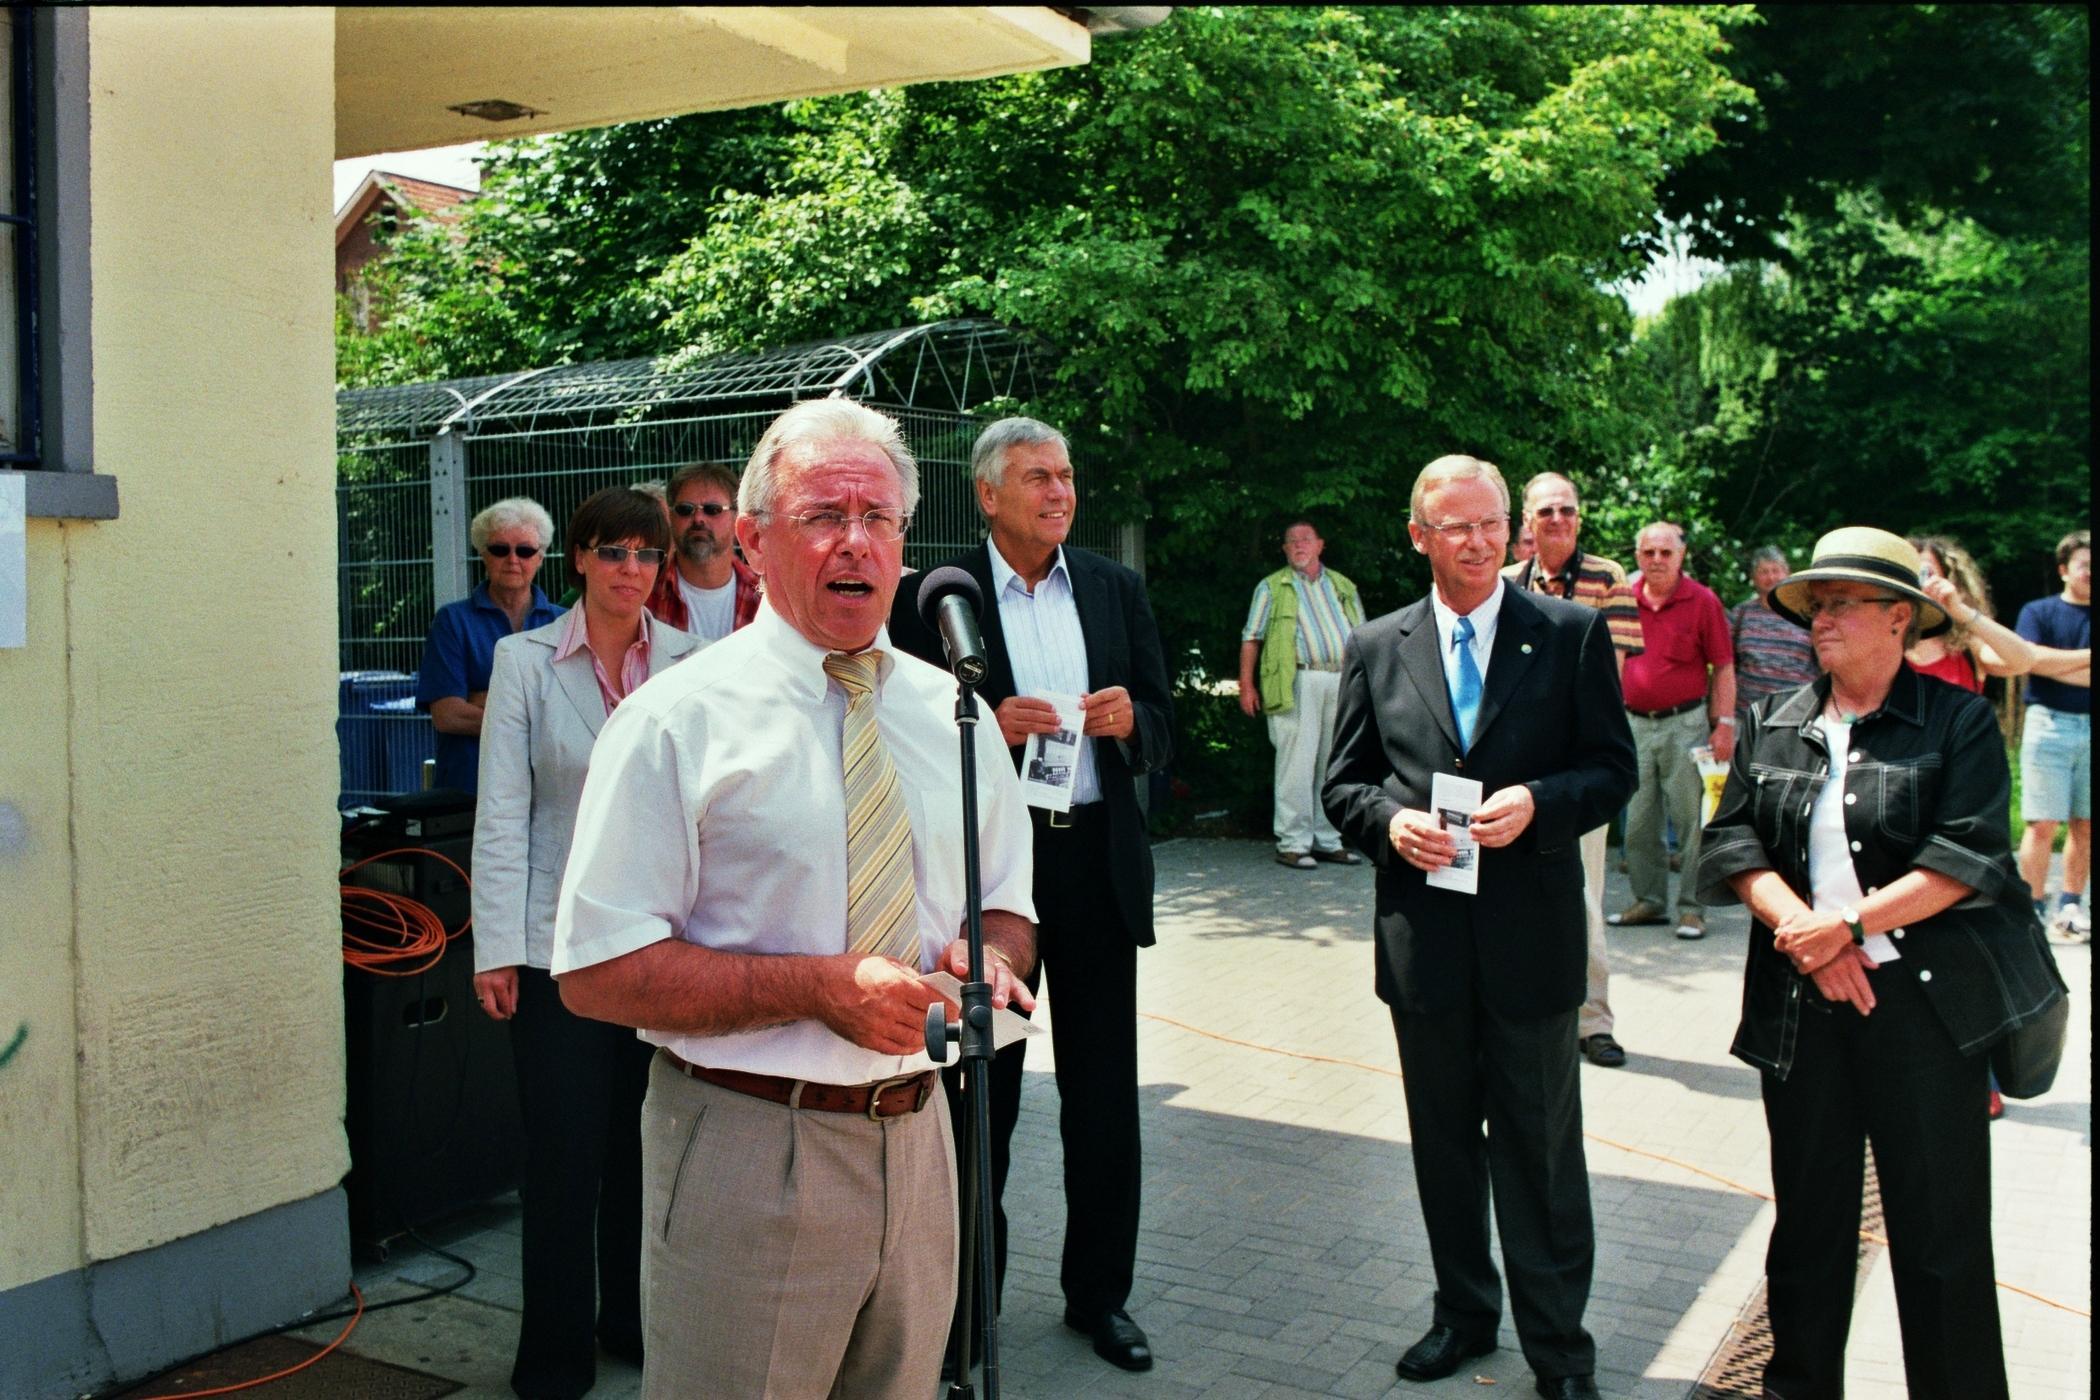 Bürgermeister Karl Hartmann begrüßt die Gäste in Reinheim